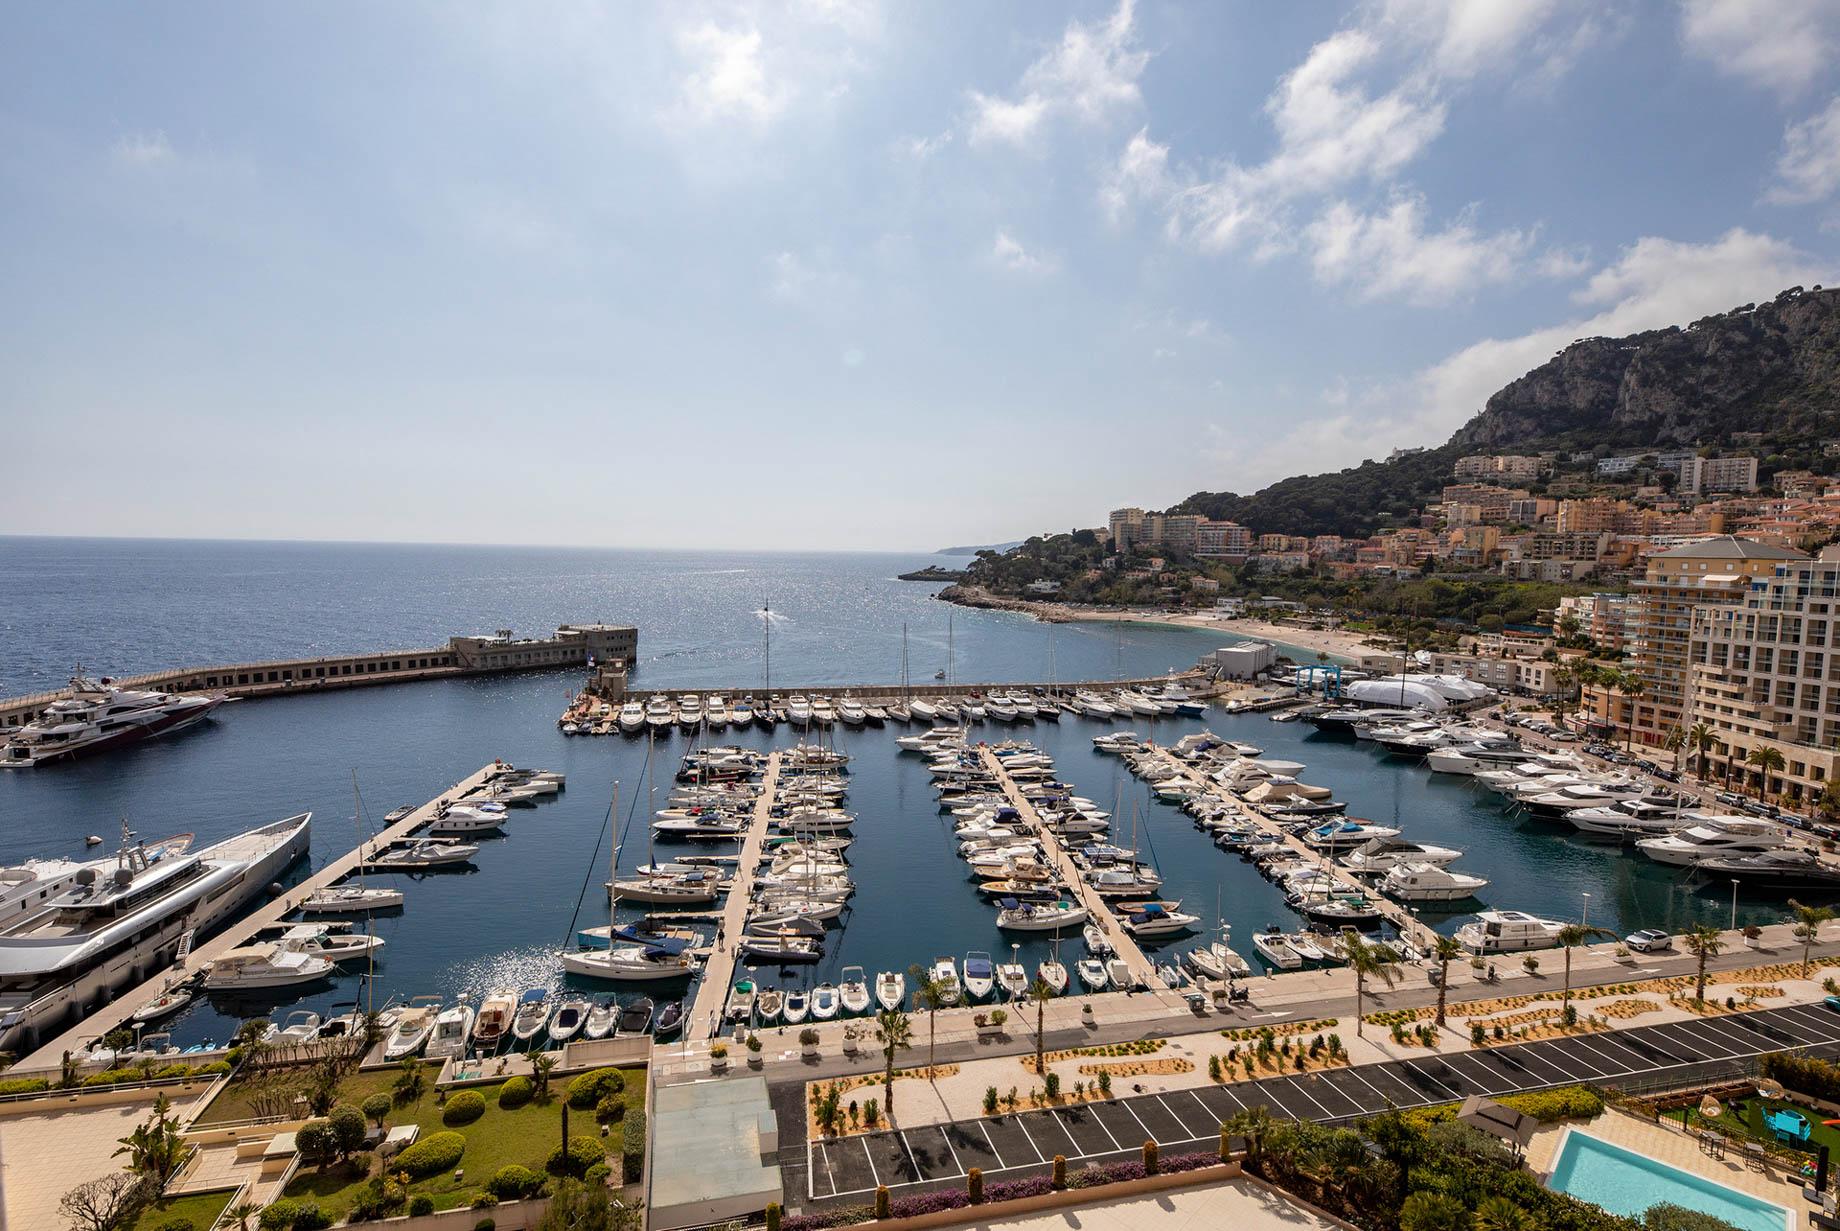 Seaside Plaza Monaco Luxury Apartment For Sale in Fontvieille, Principality of Monaco - Marina